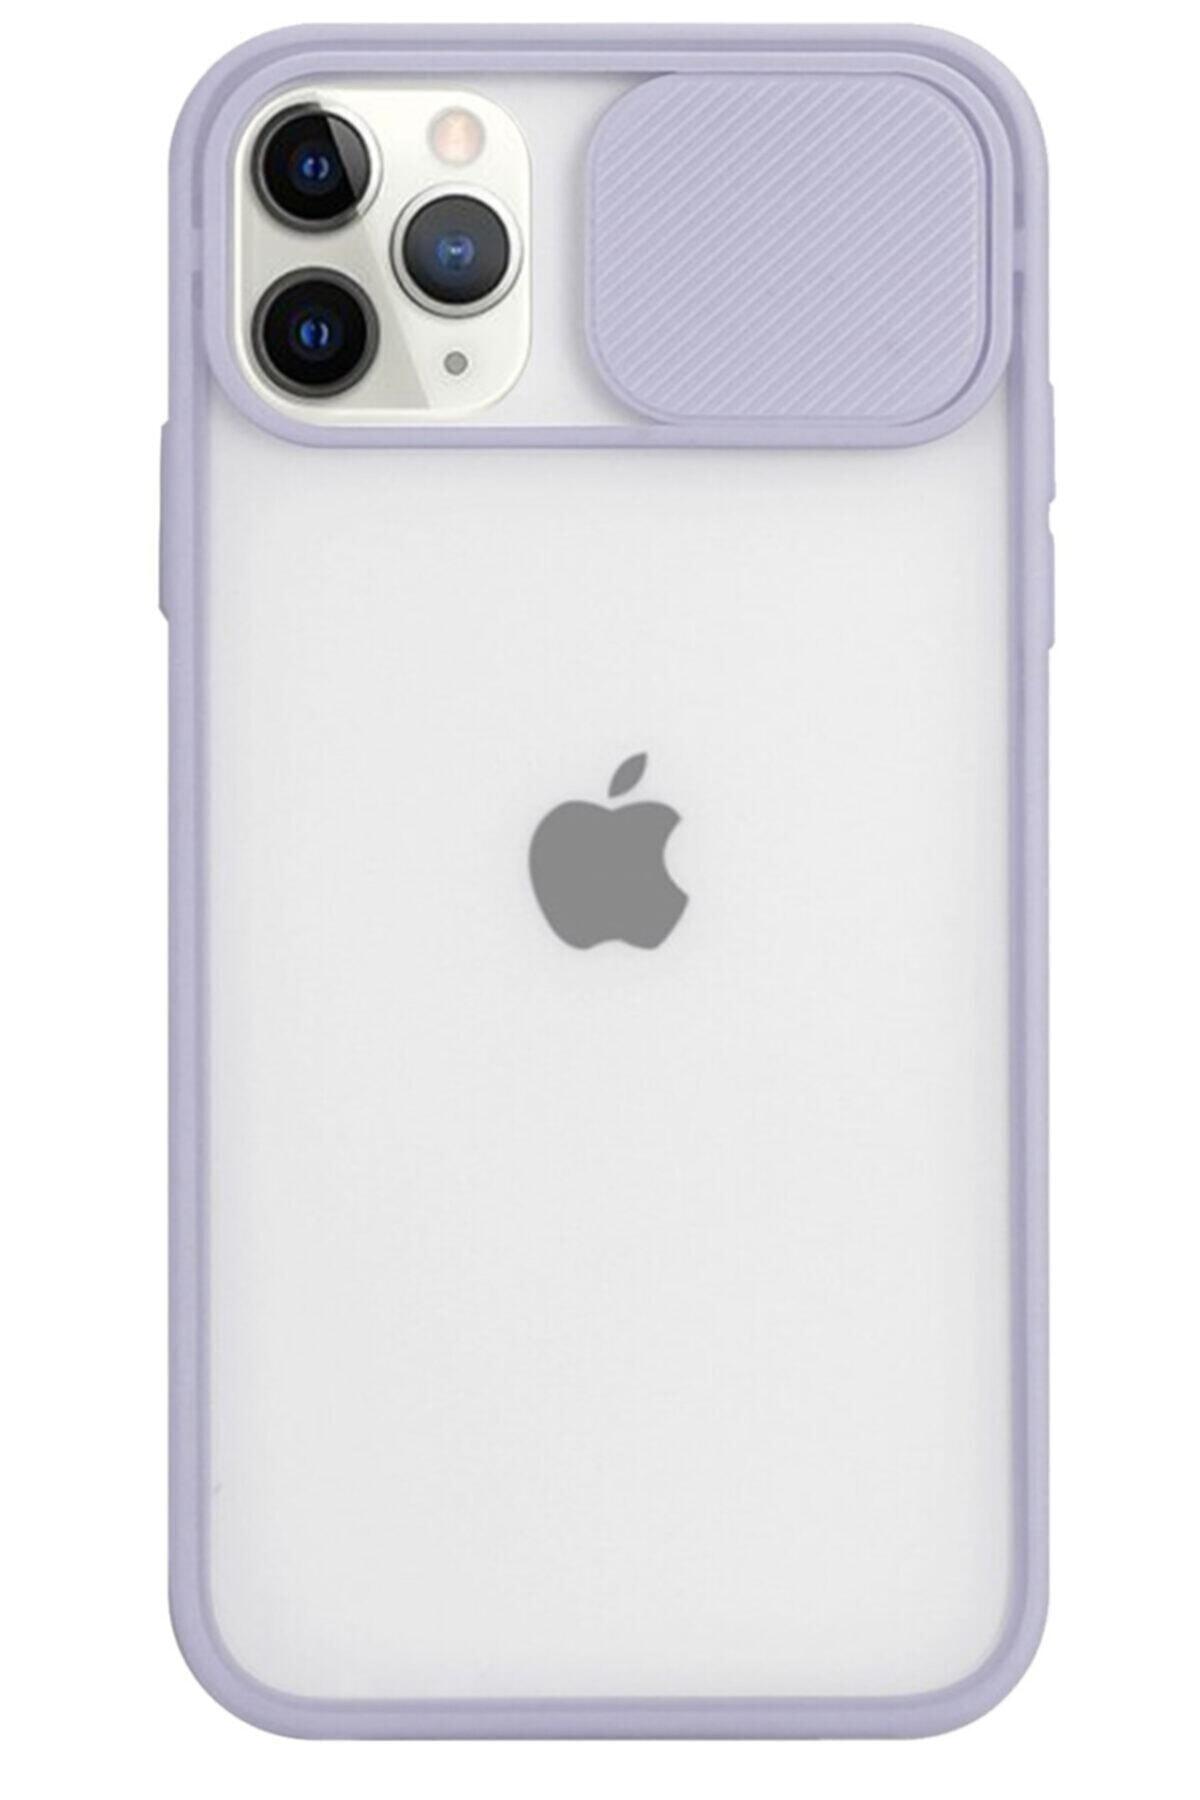 Iphone 12 Pro Max Kamera Korumalı Slayt Telefon Kılıfı